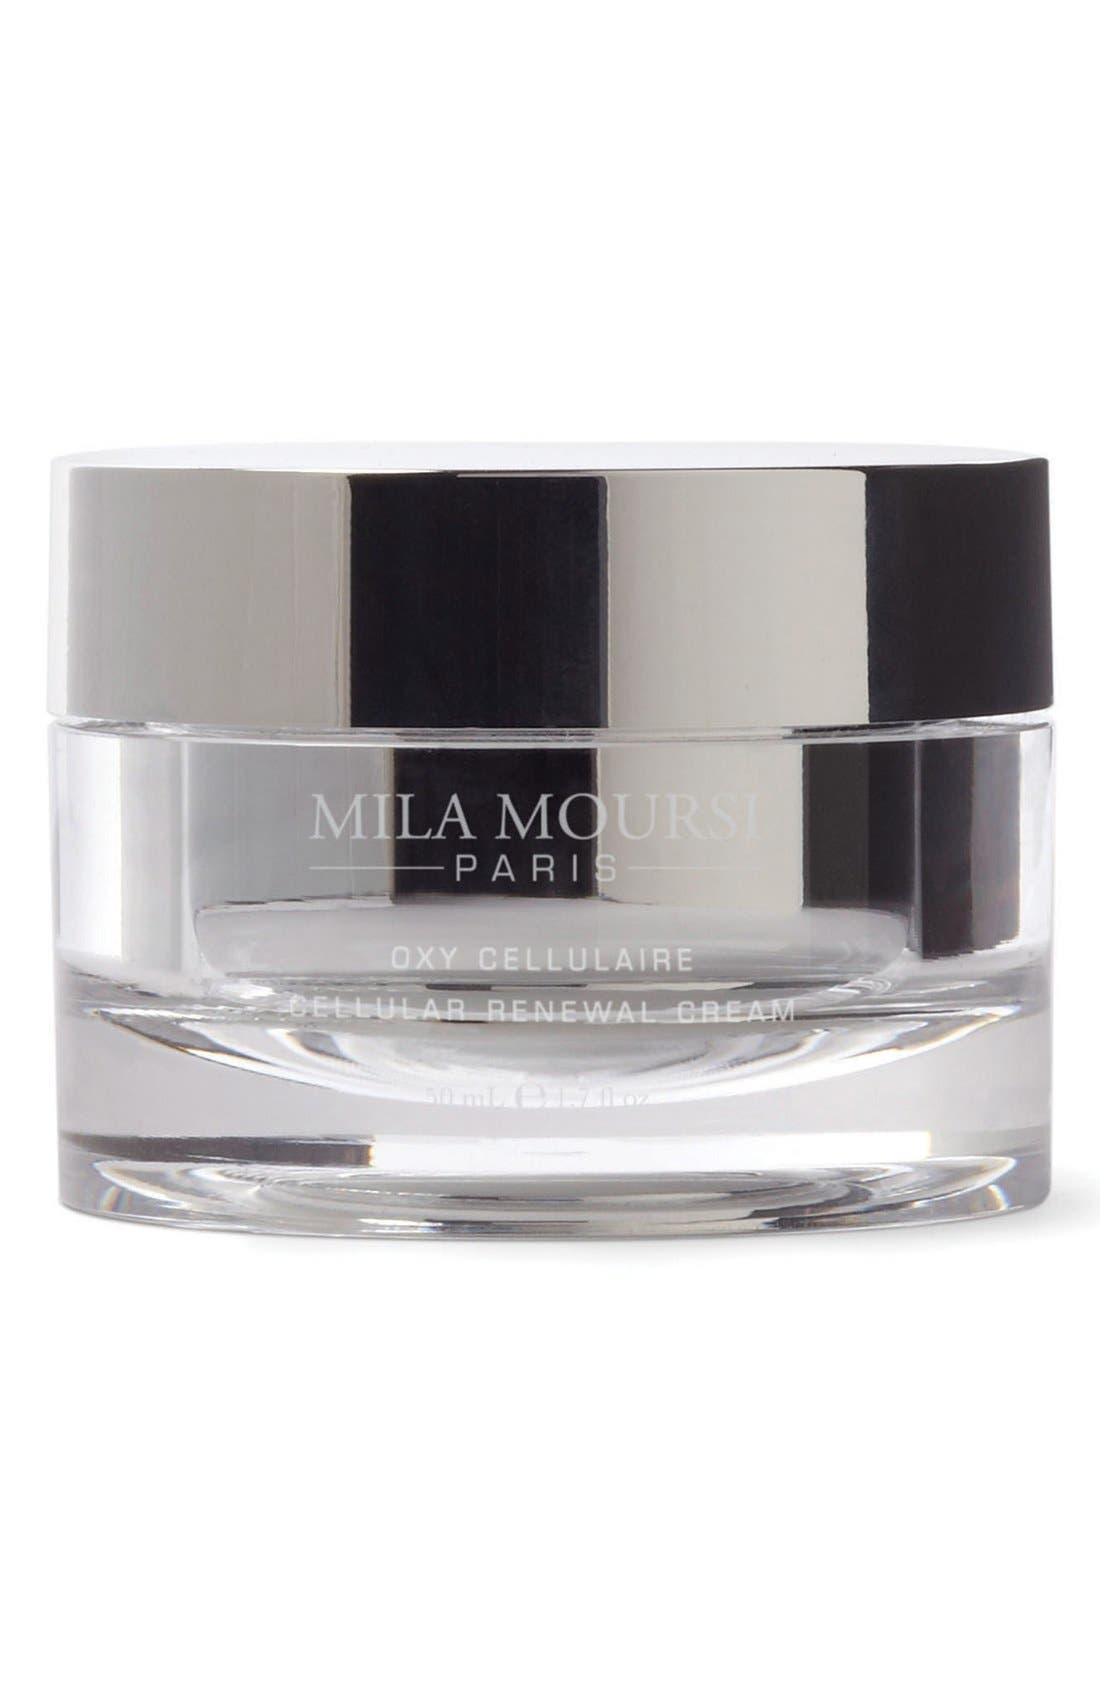 SPACE.NK.apothecary Mila Moursi Oxy Cellular Renewal Cream